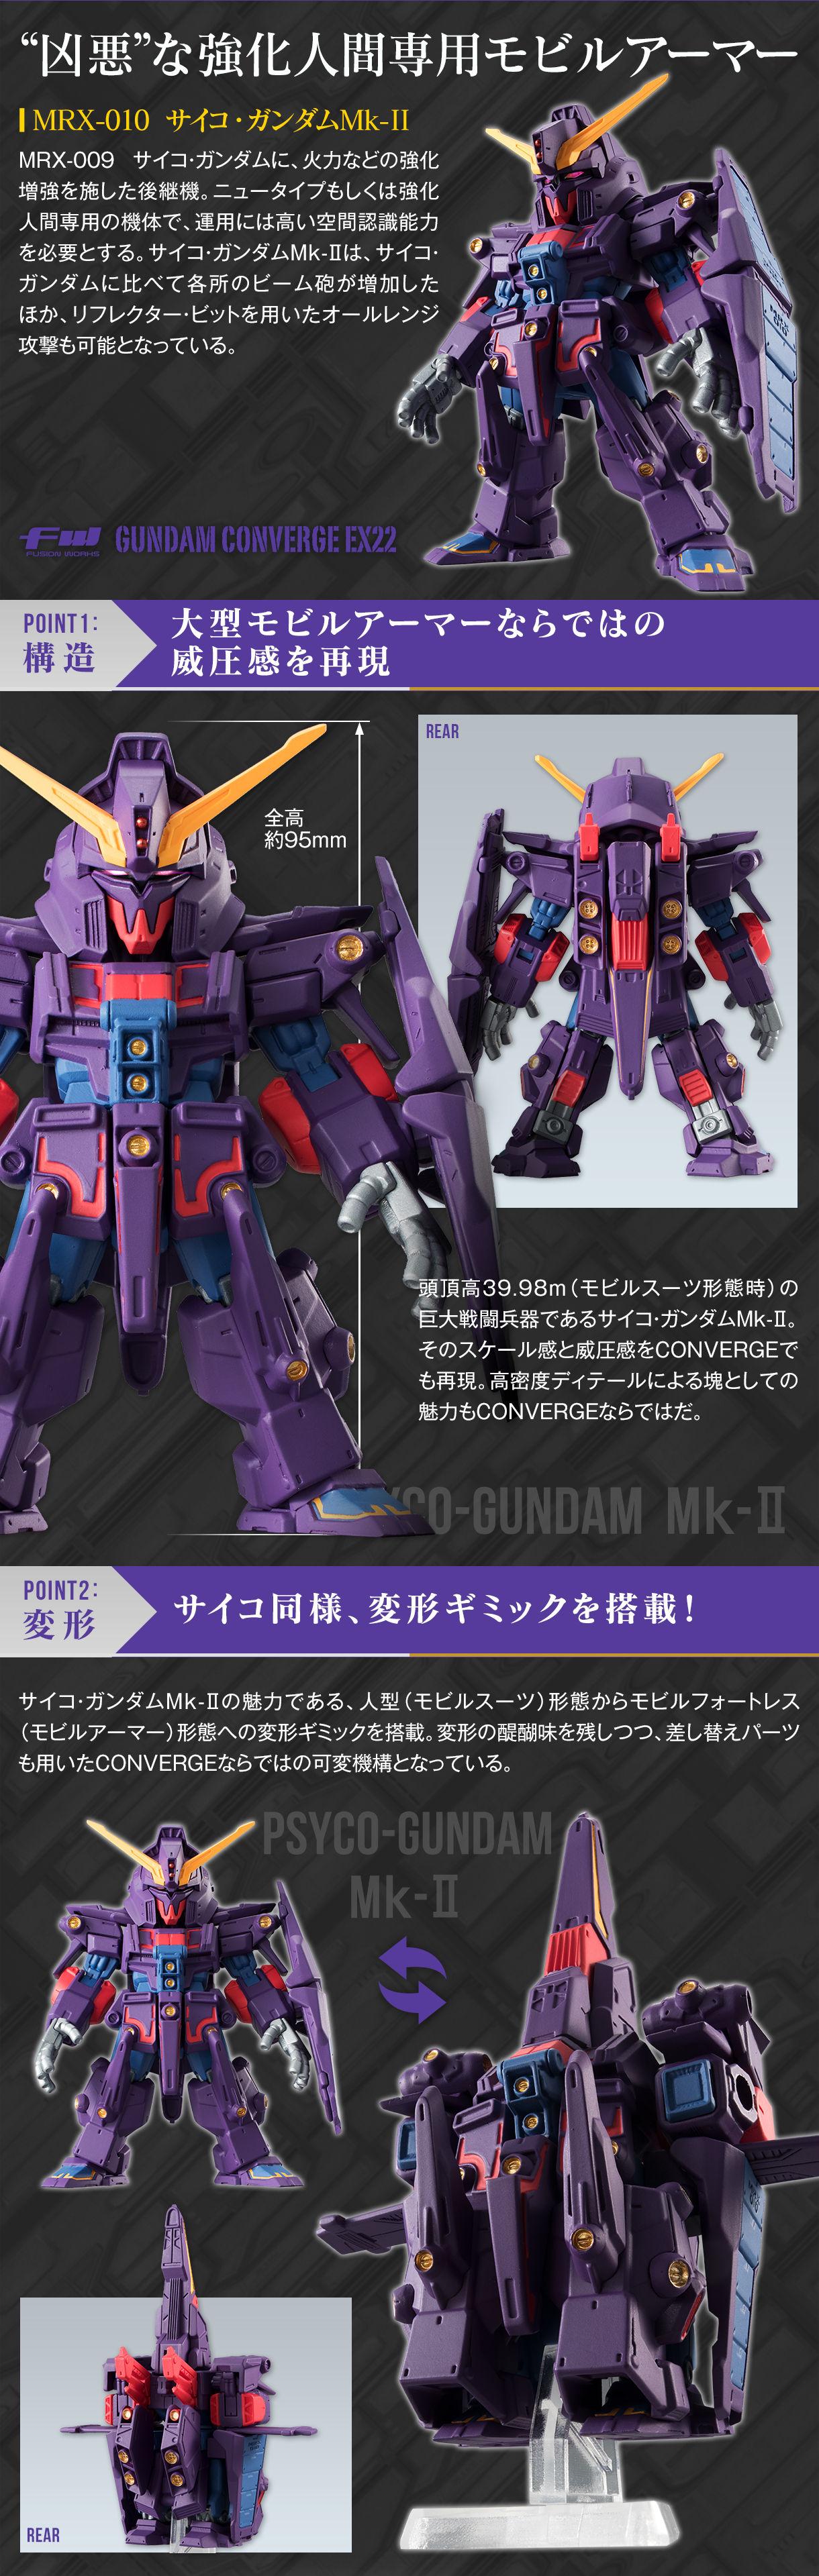 FW GUNDAM CONVERGE EX22 サイコ・ガンダムMk-II